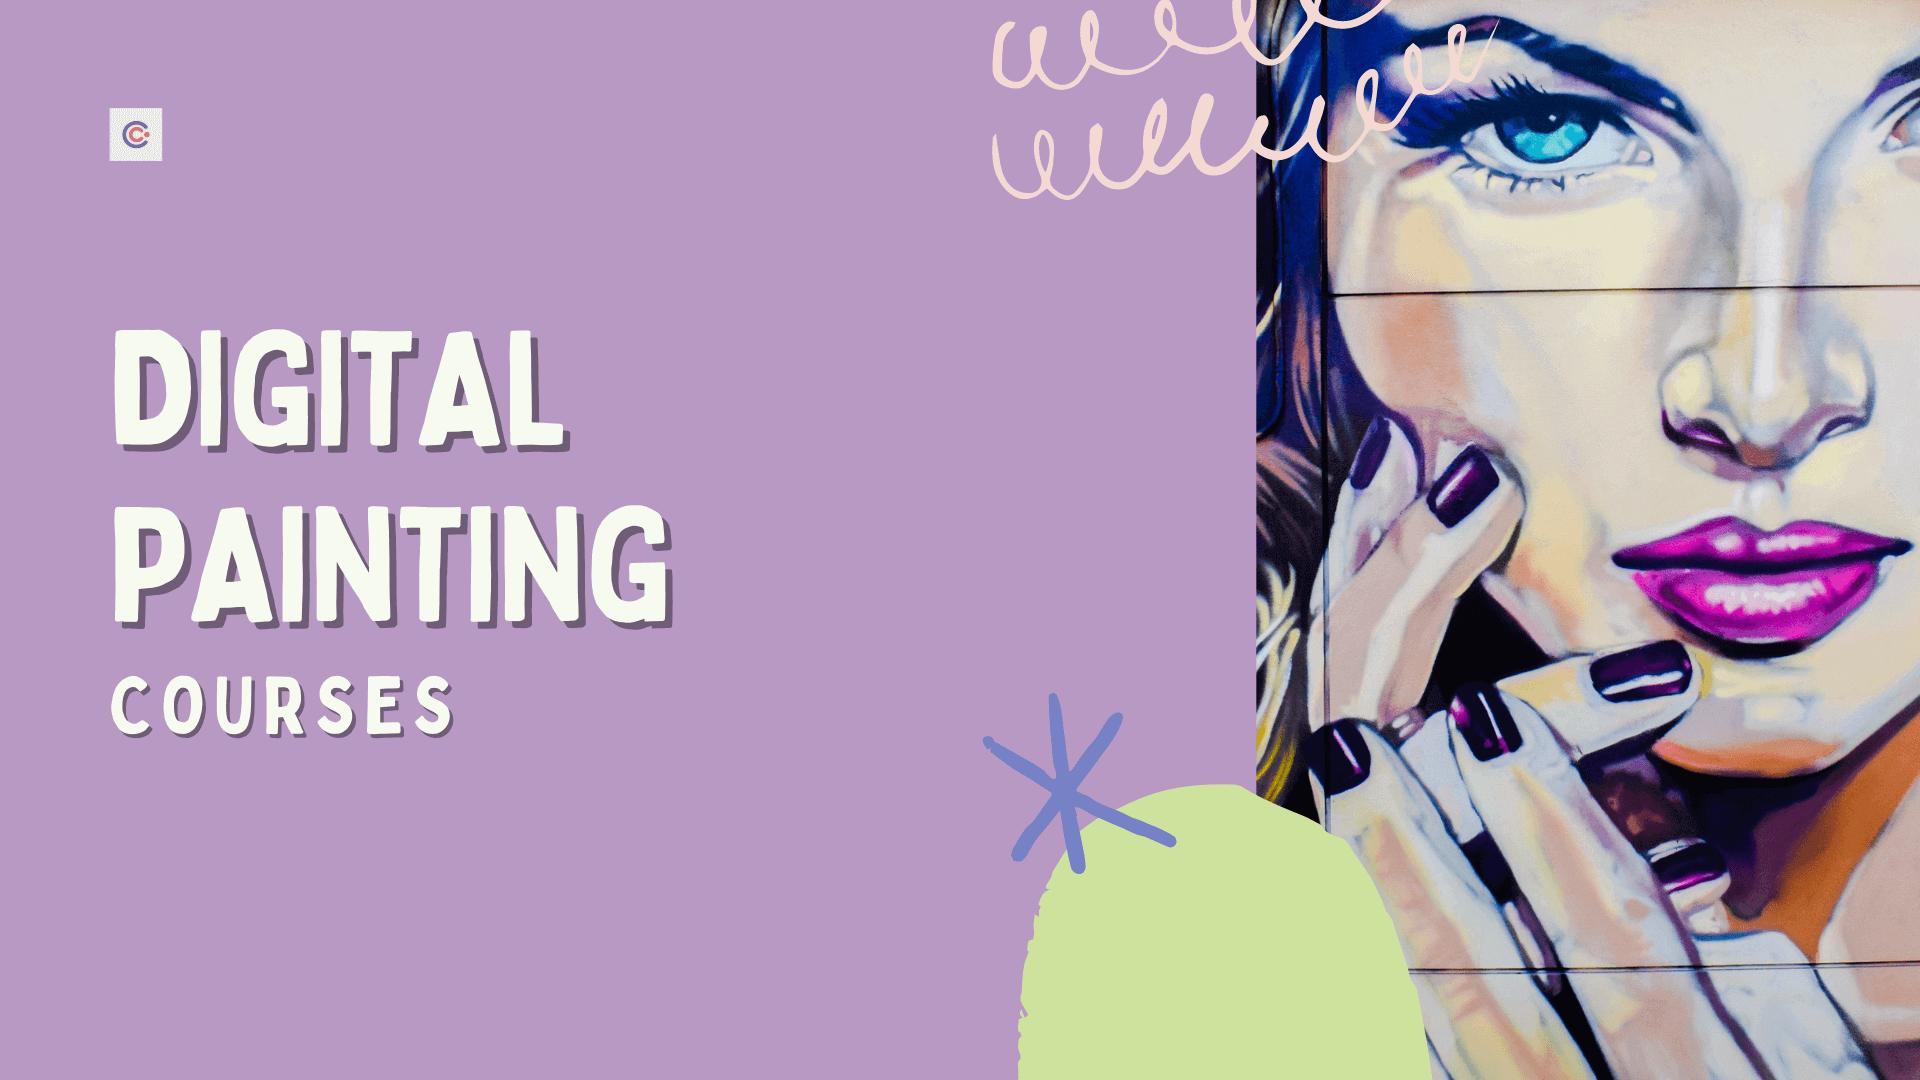 4 Best Digital Painting Courses - Learn Digital Painting Online